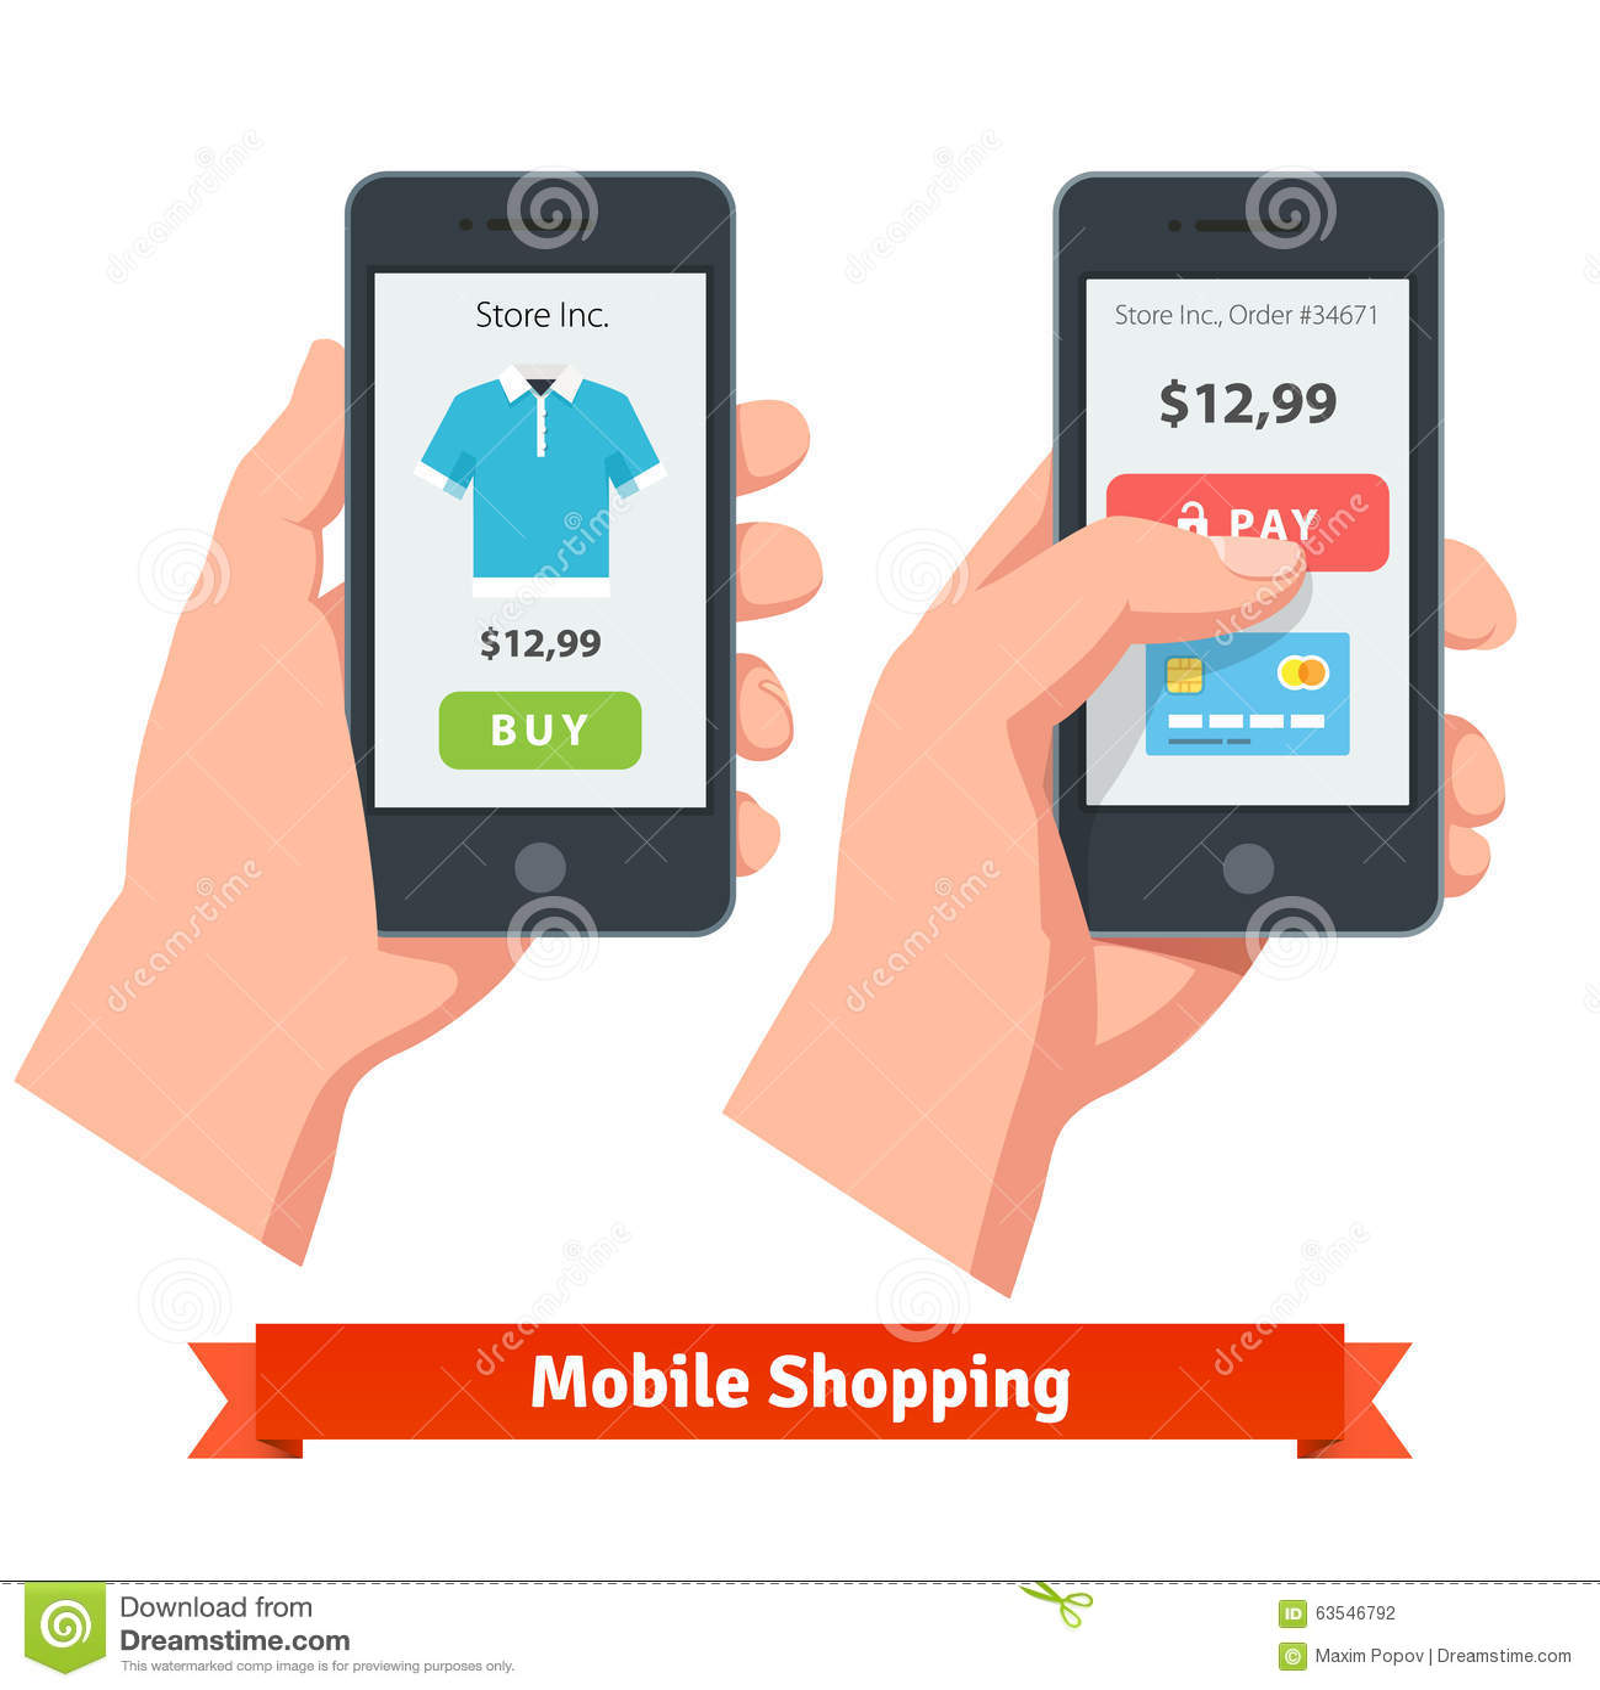 Mobile smartphone ecommerce online shopping stock vector for Shopping mobili online